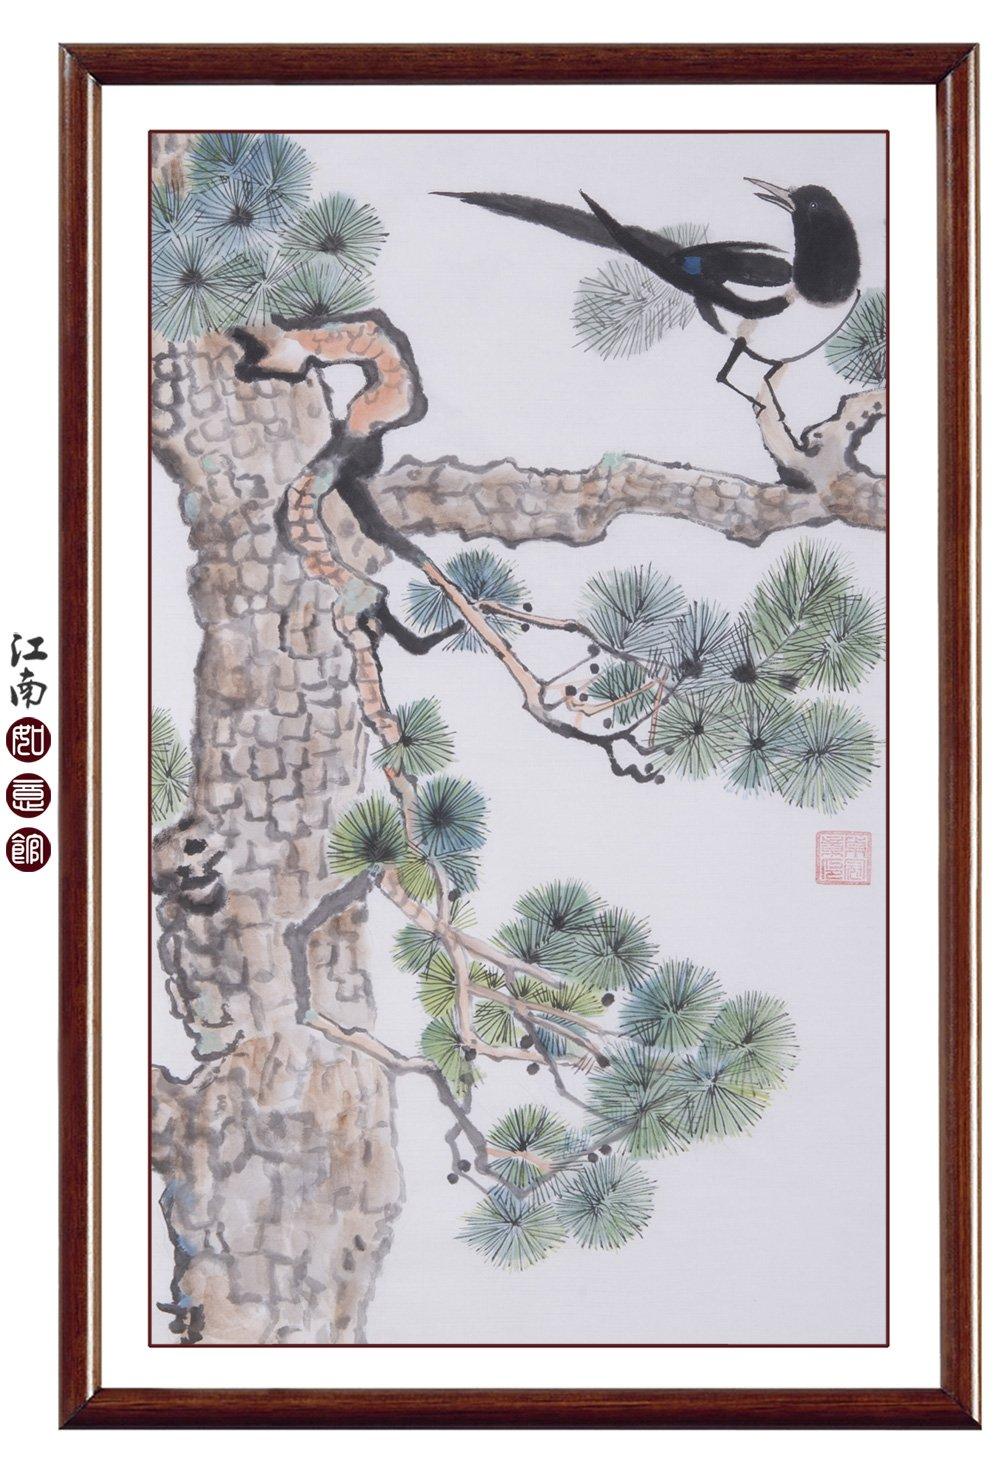 Amazon.de: jiangnanruyi Art Elster Vogel Kiefer Baum handbemalt ...